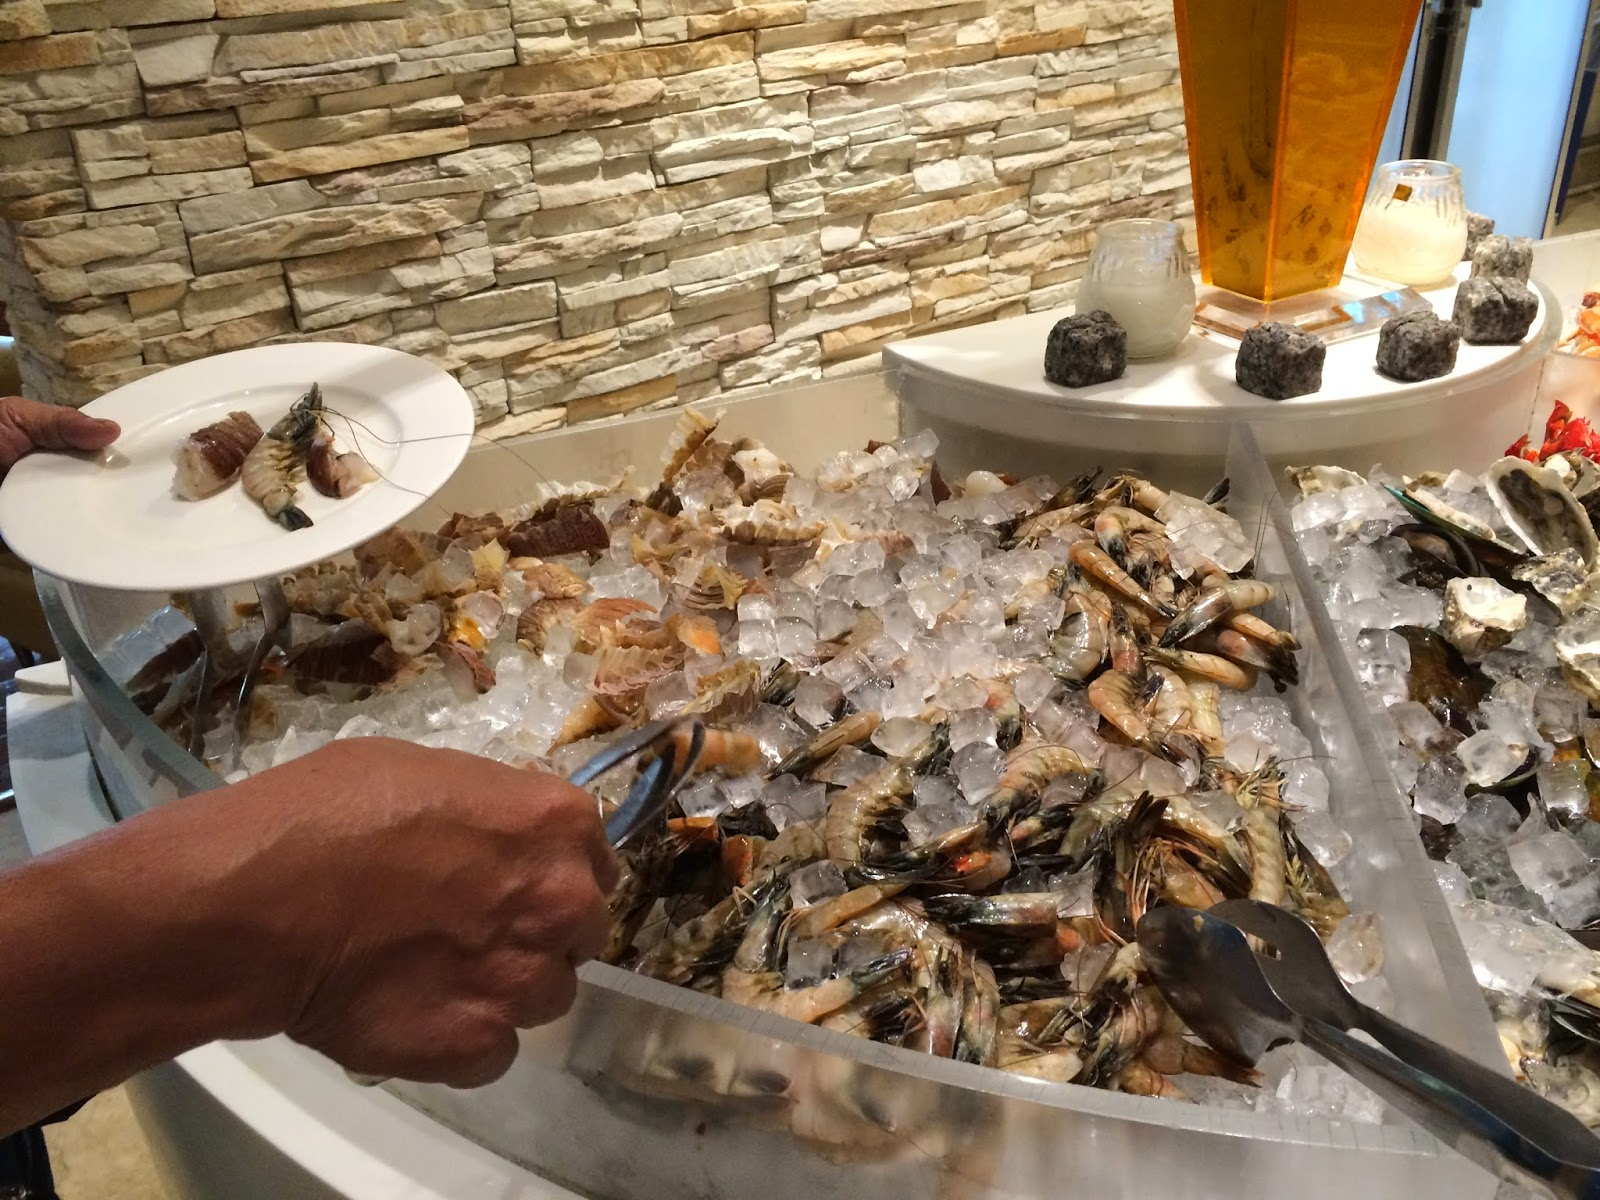 seafood buffet tucson home interior designer today u2022 rh momomomo co Fried Seafood Buffet Best Seafood Buffet